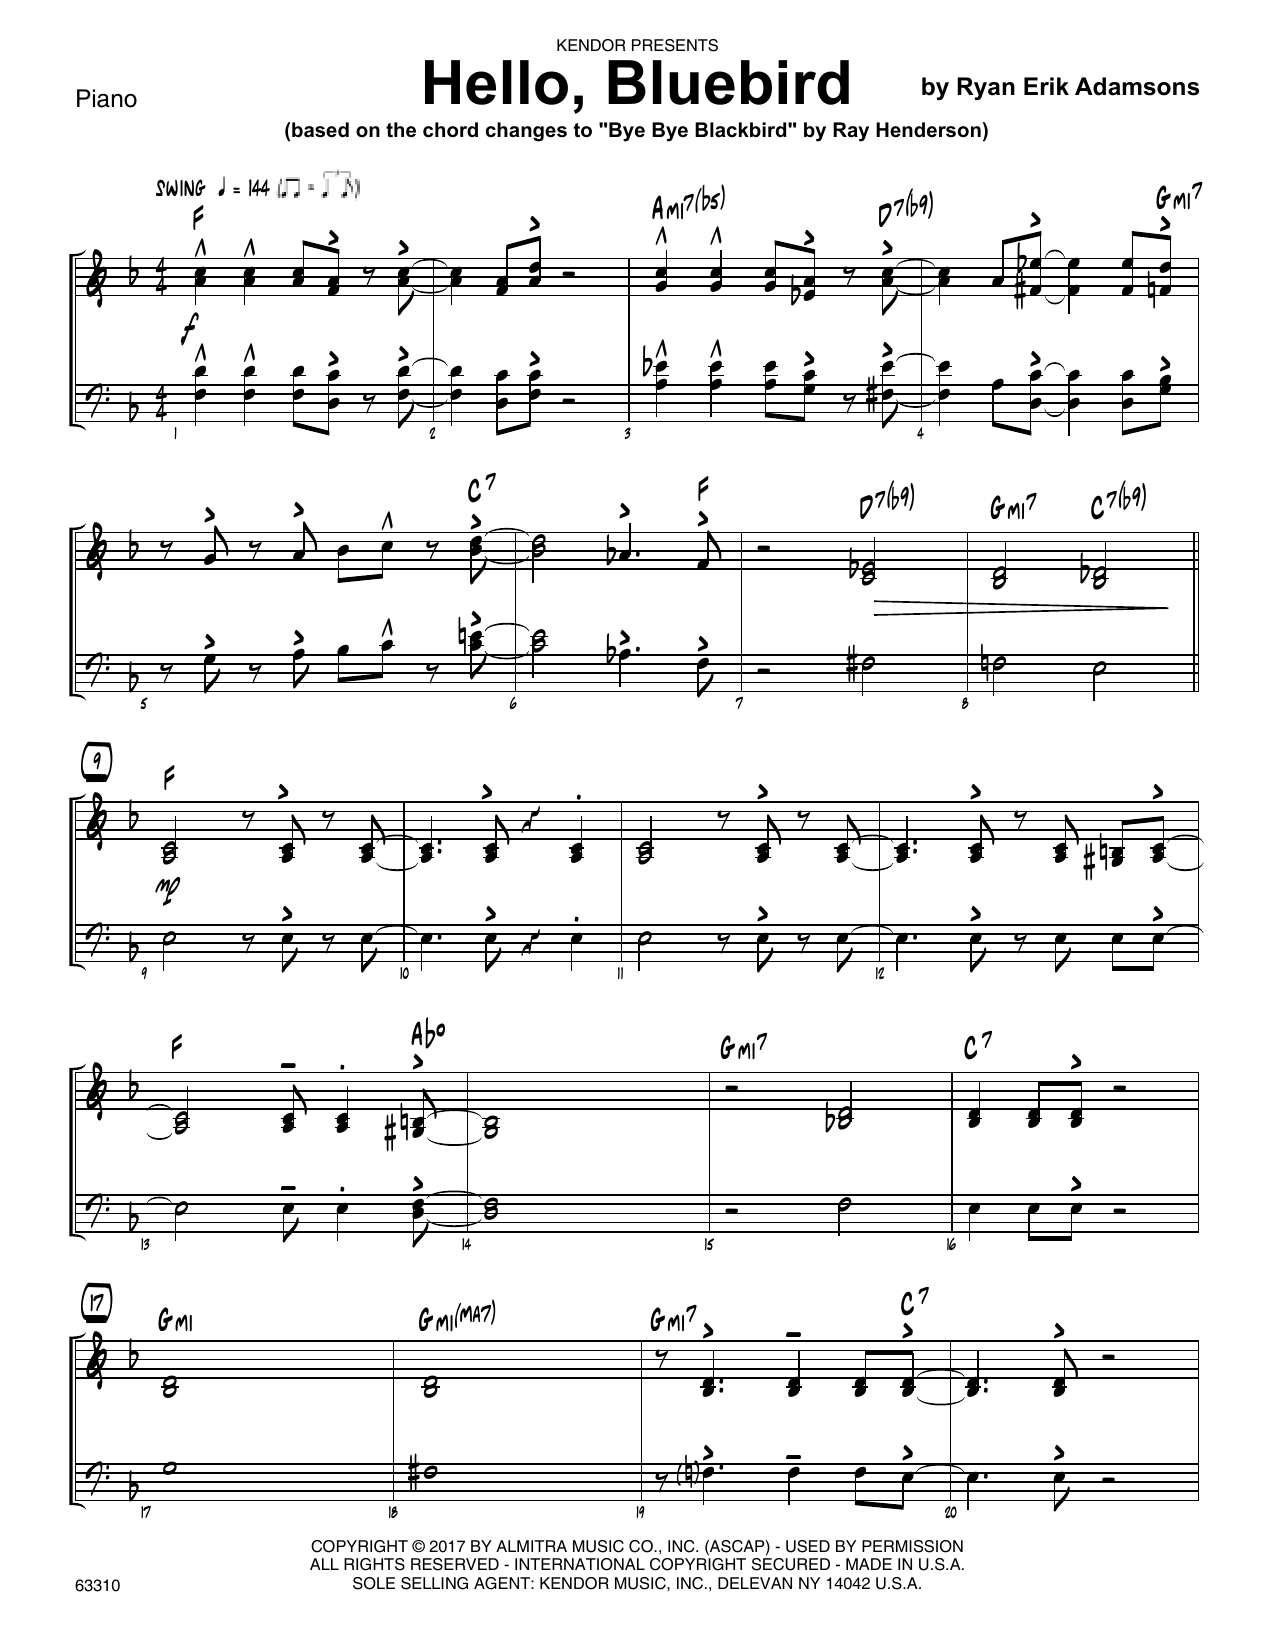 Ryan Erik Adamsons Hello, Bluebird (based on Bye Bye Blackbird) - Piano sheet music notes printable PDF score